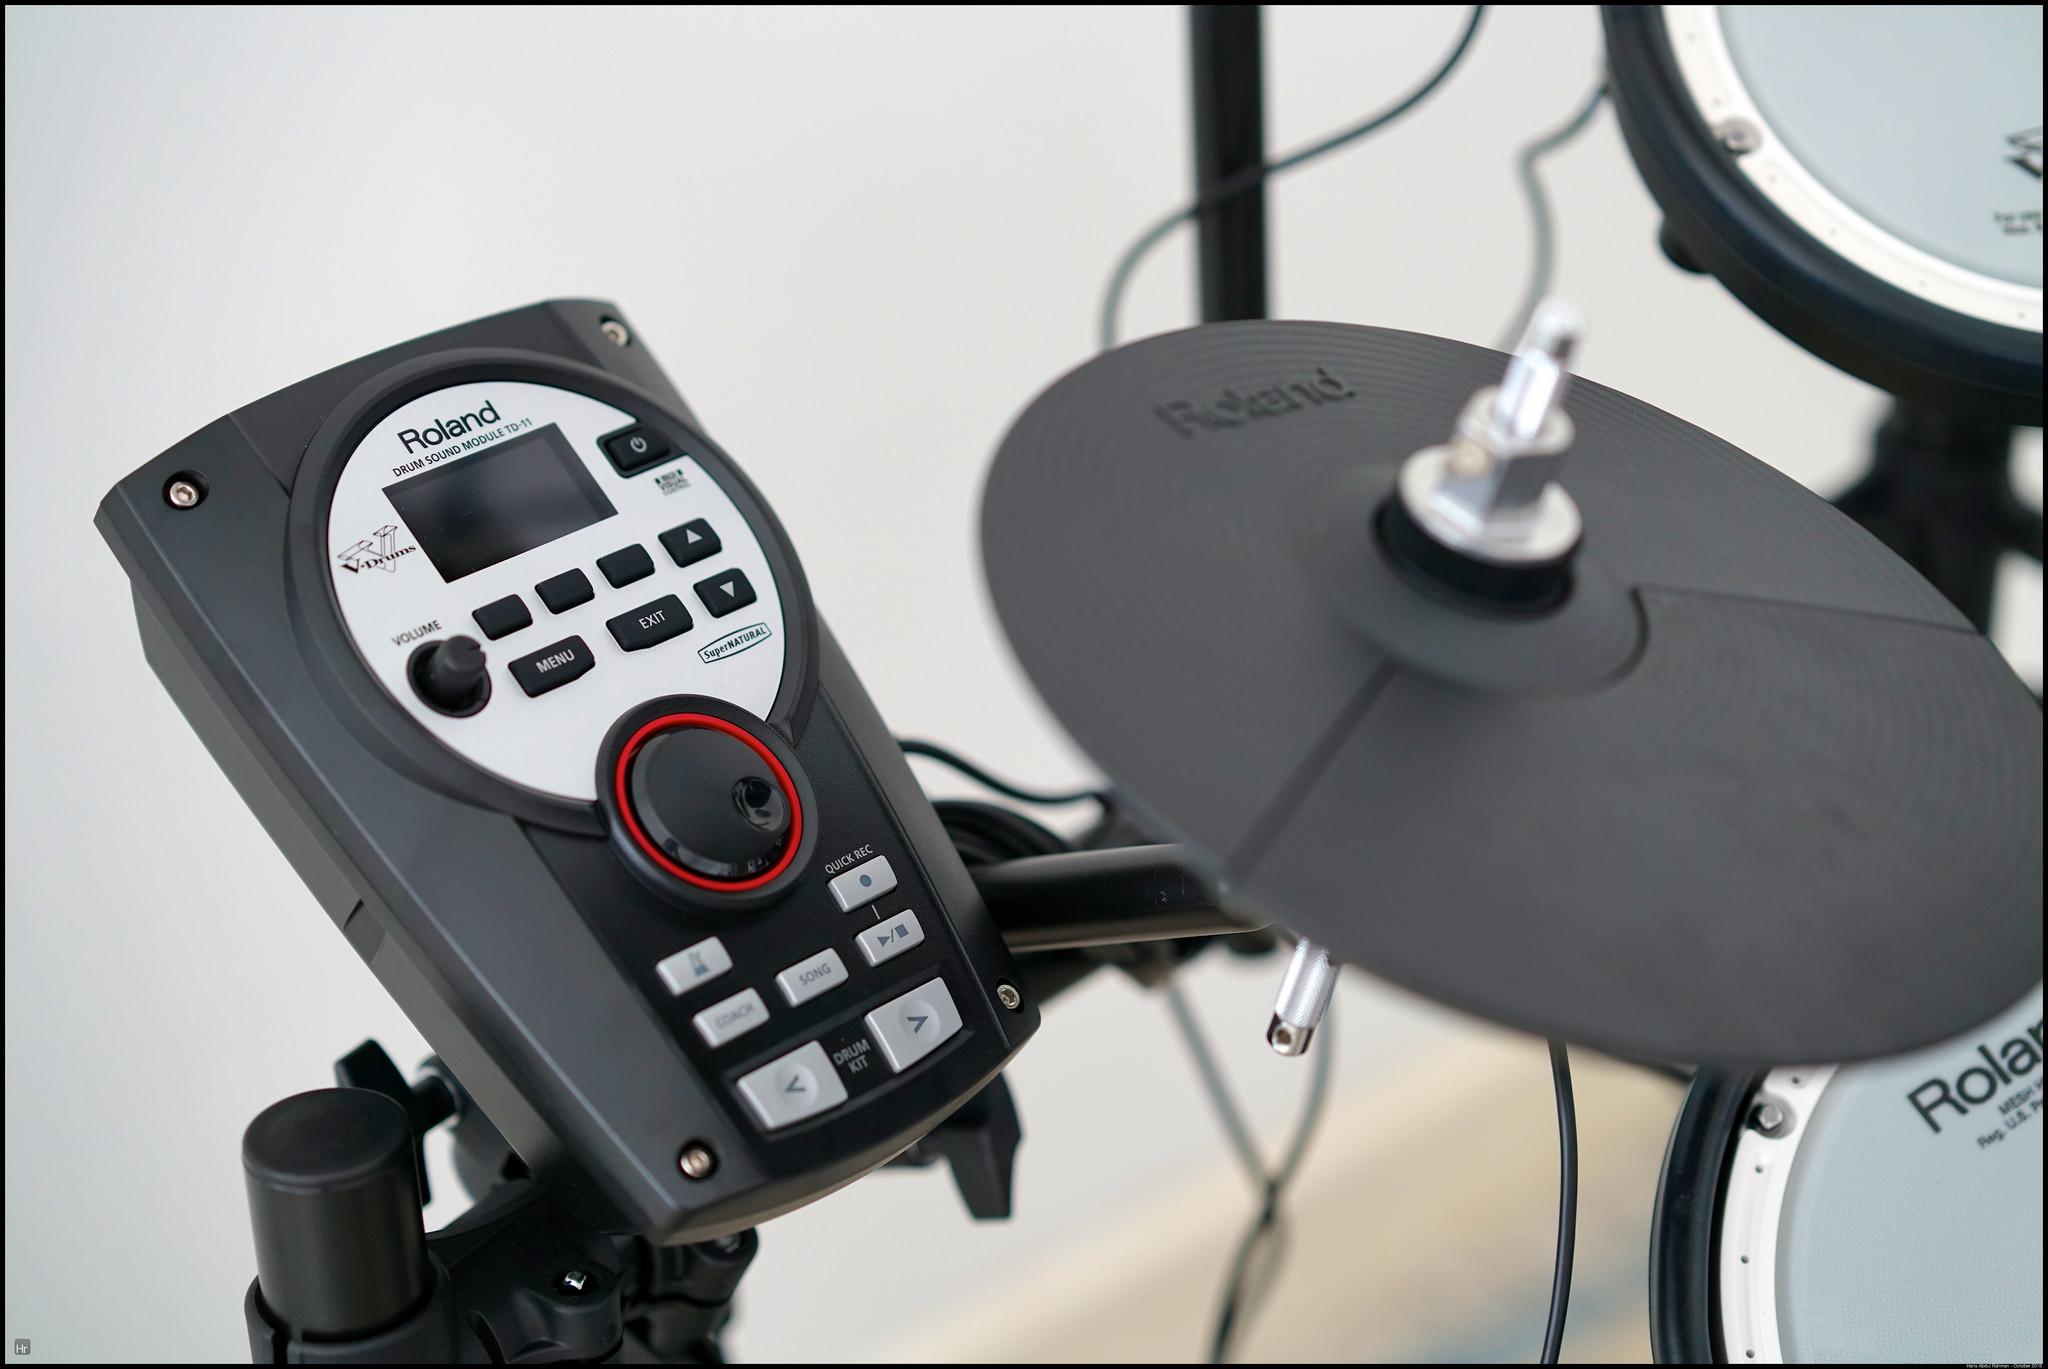 The controller module